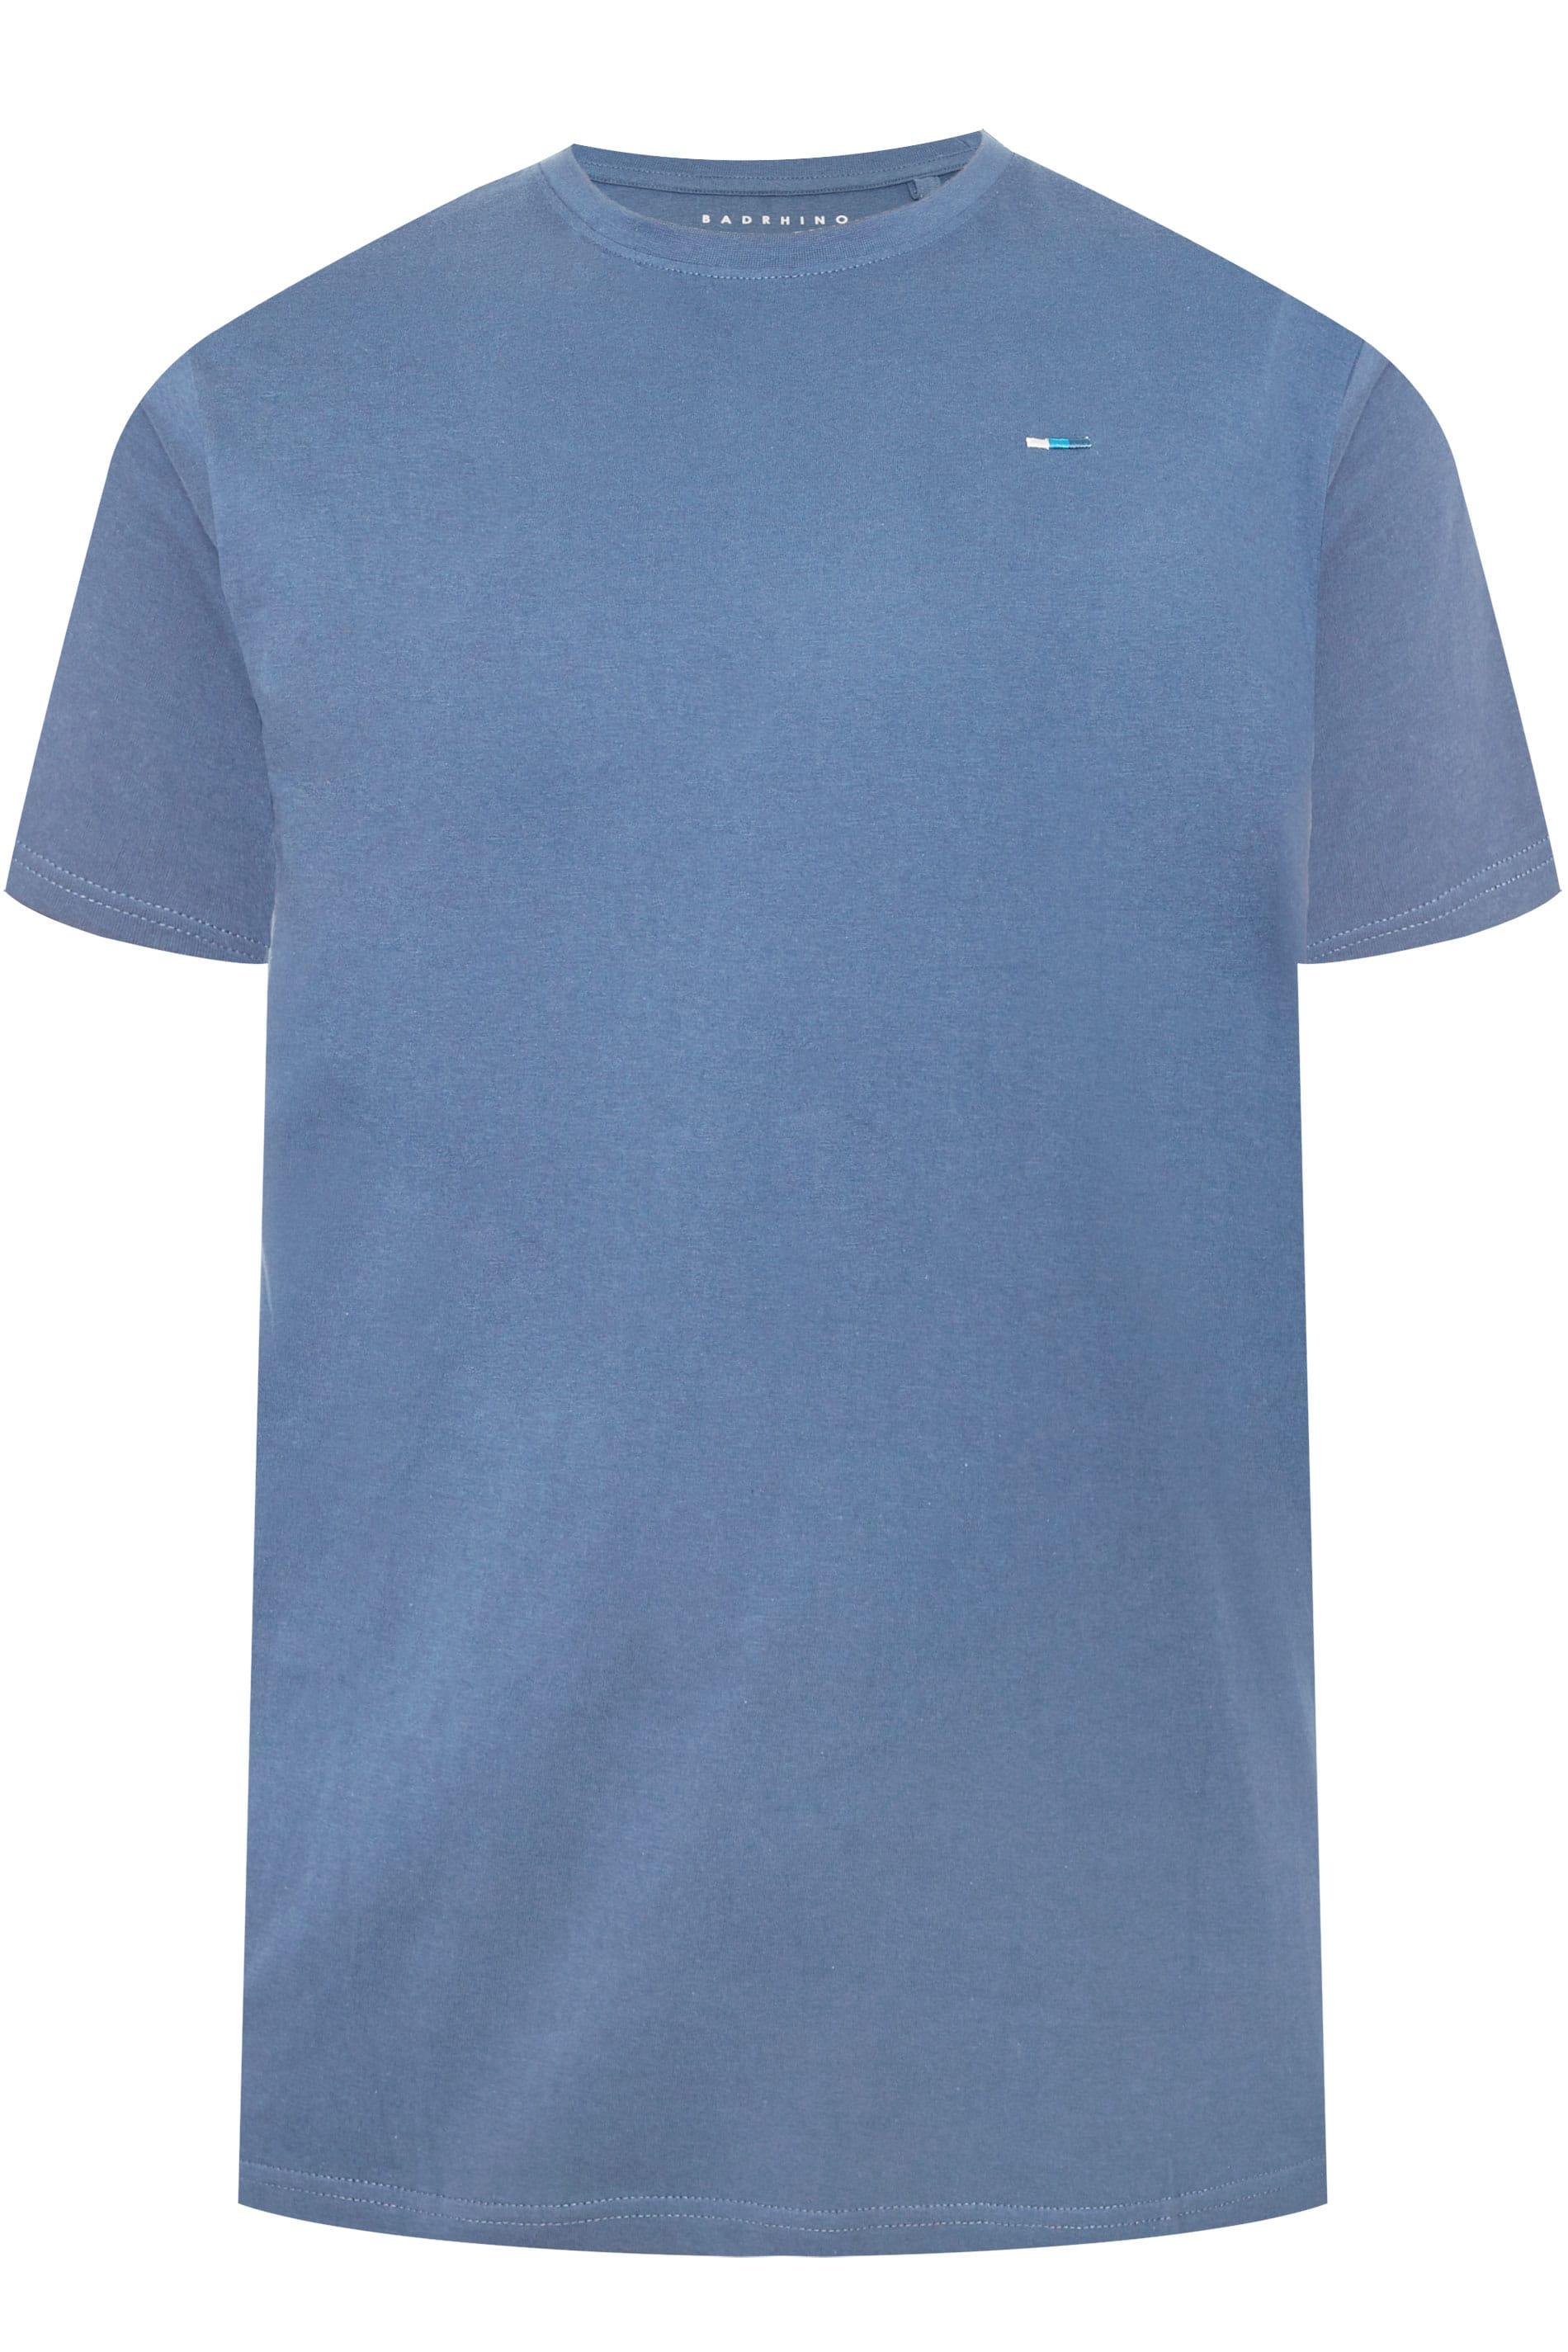 BadRhino Sky Blue Marl Crew Neck T-Shirt